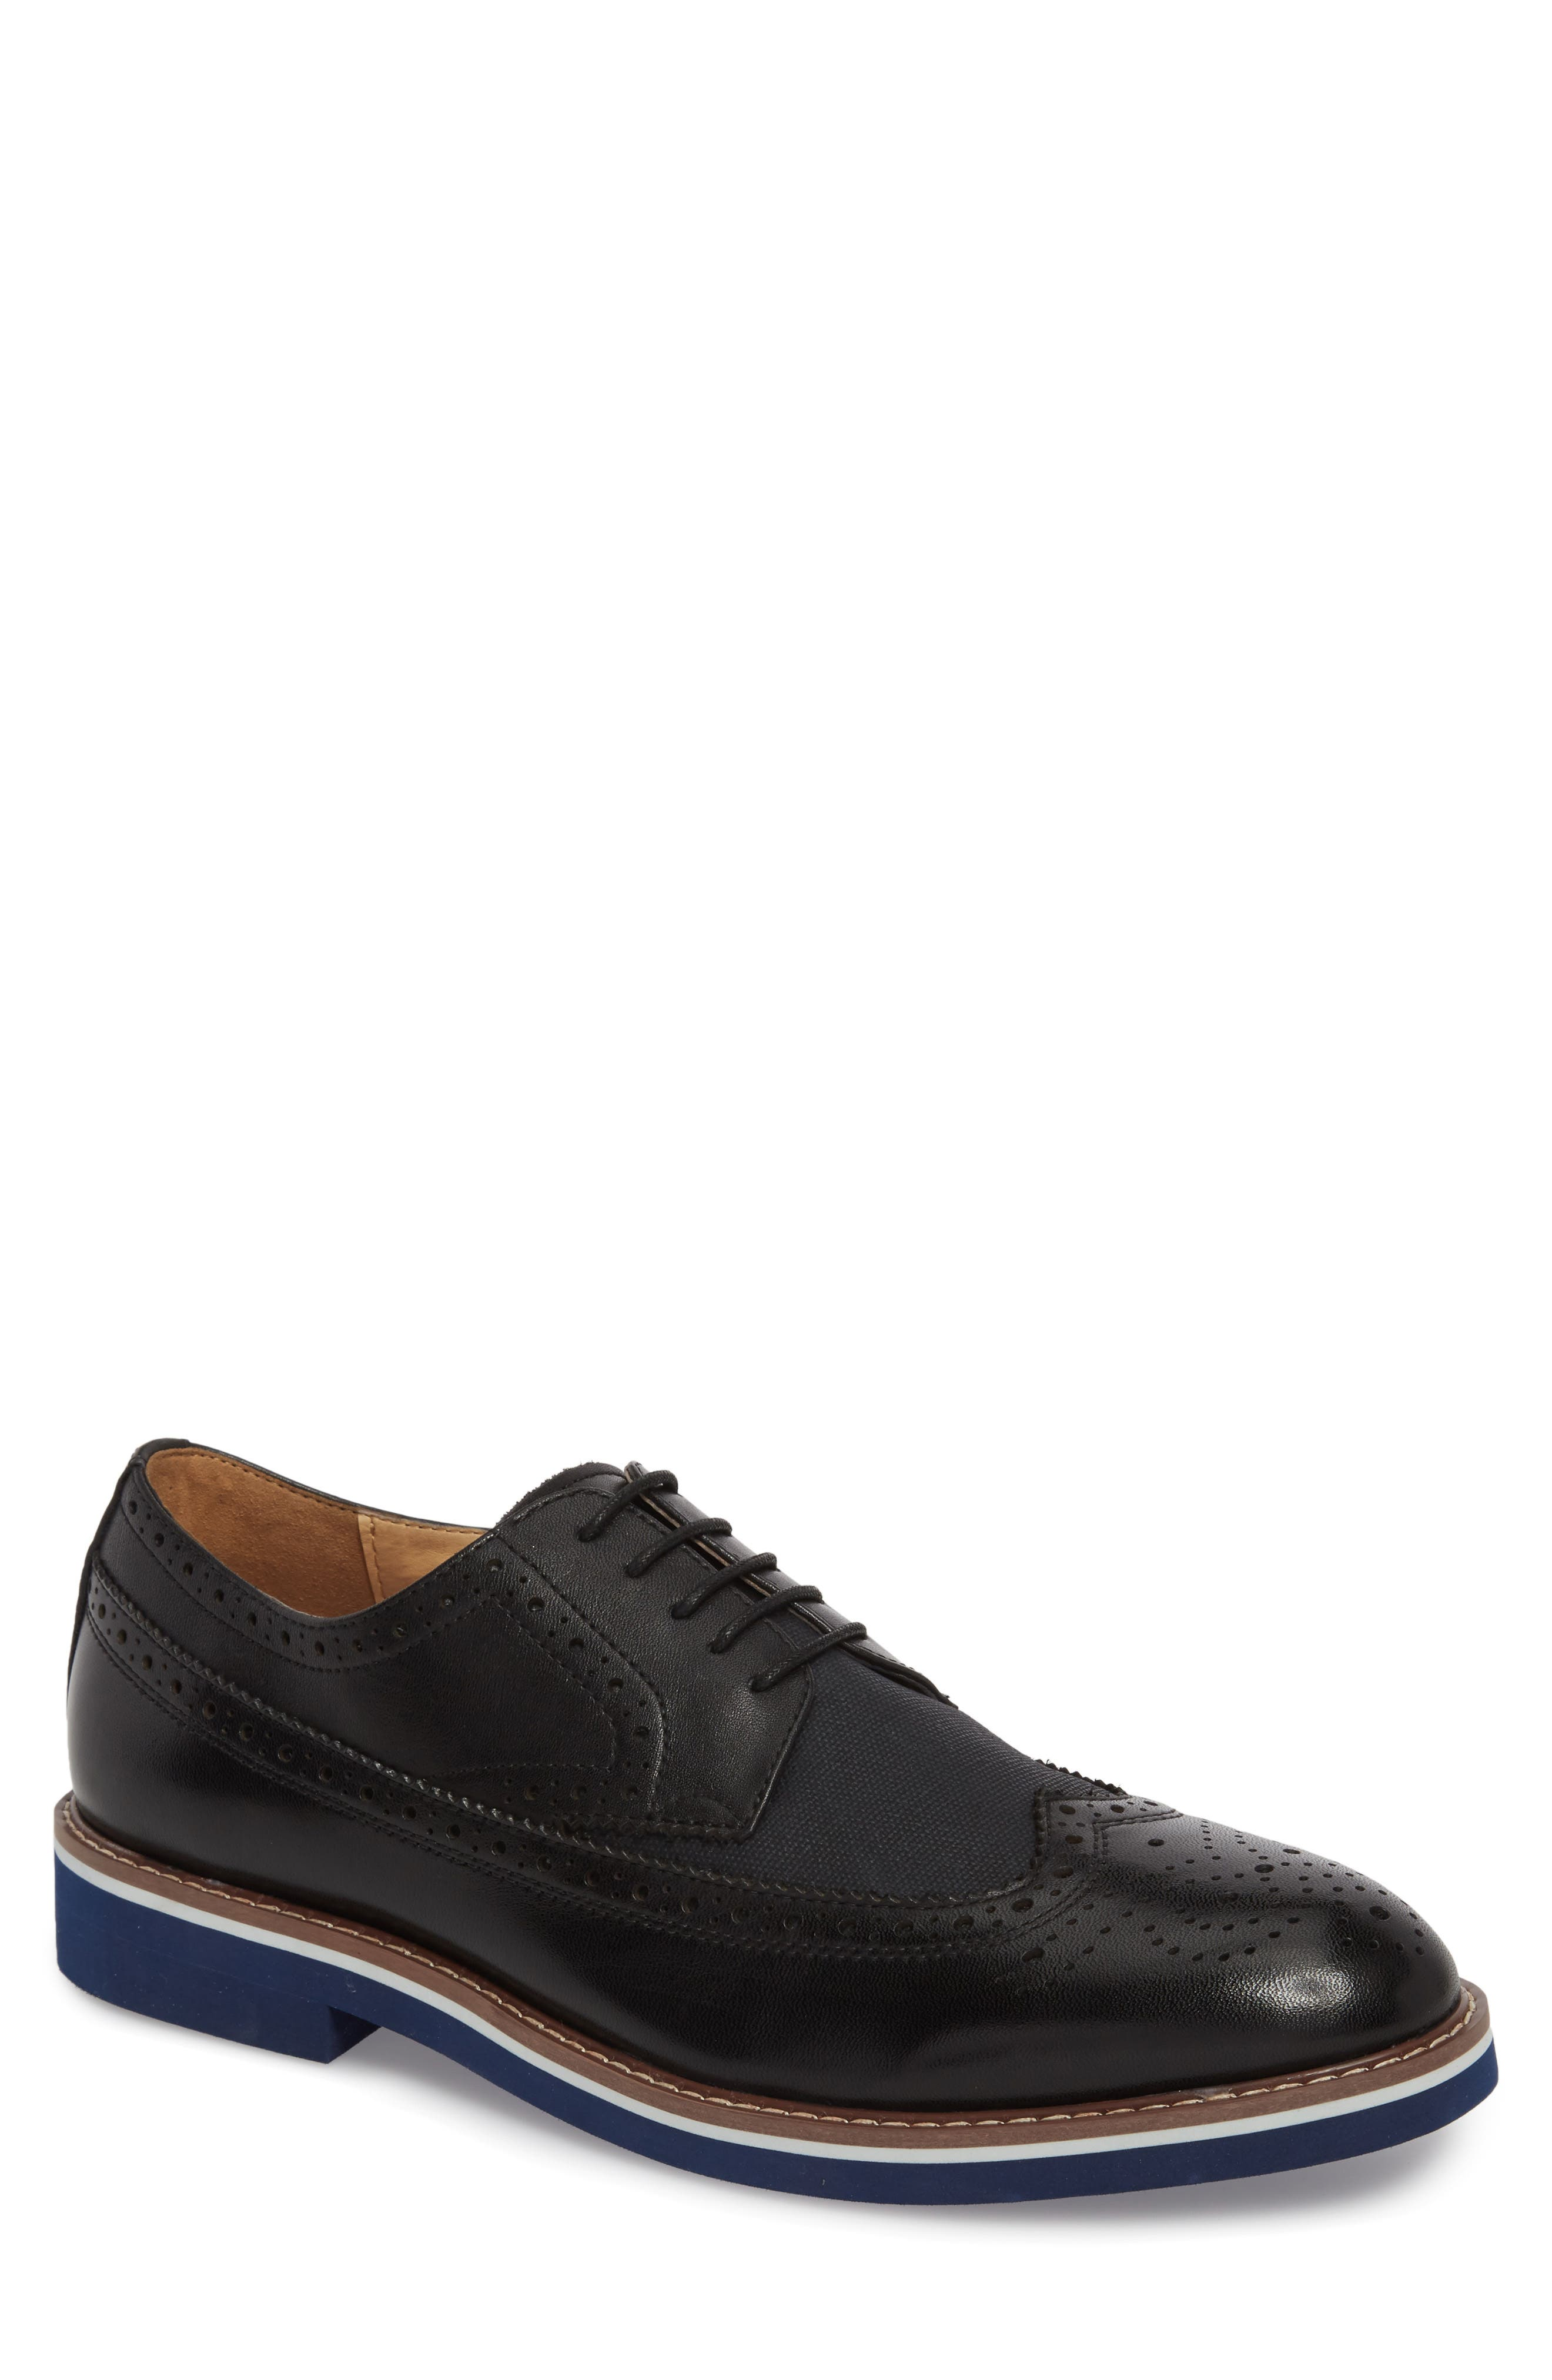 Balham Wingtip,                         Main,                         color, Black Leather